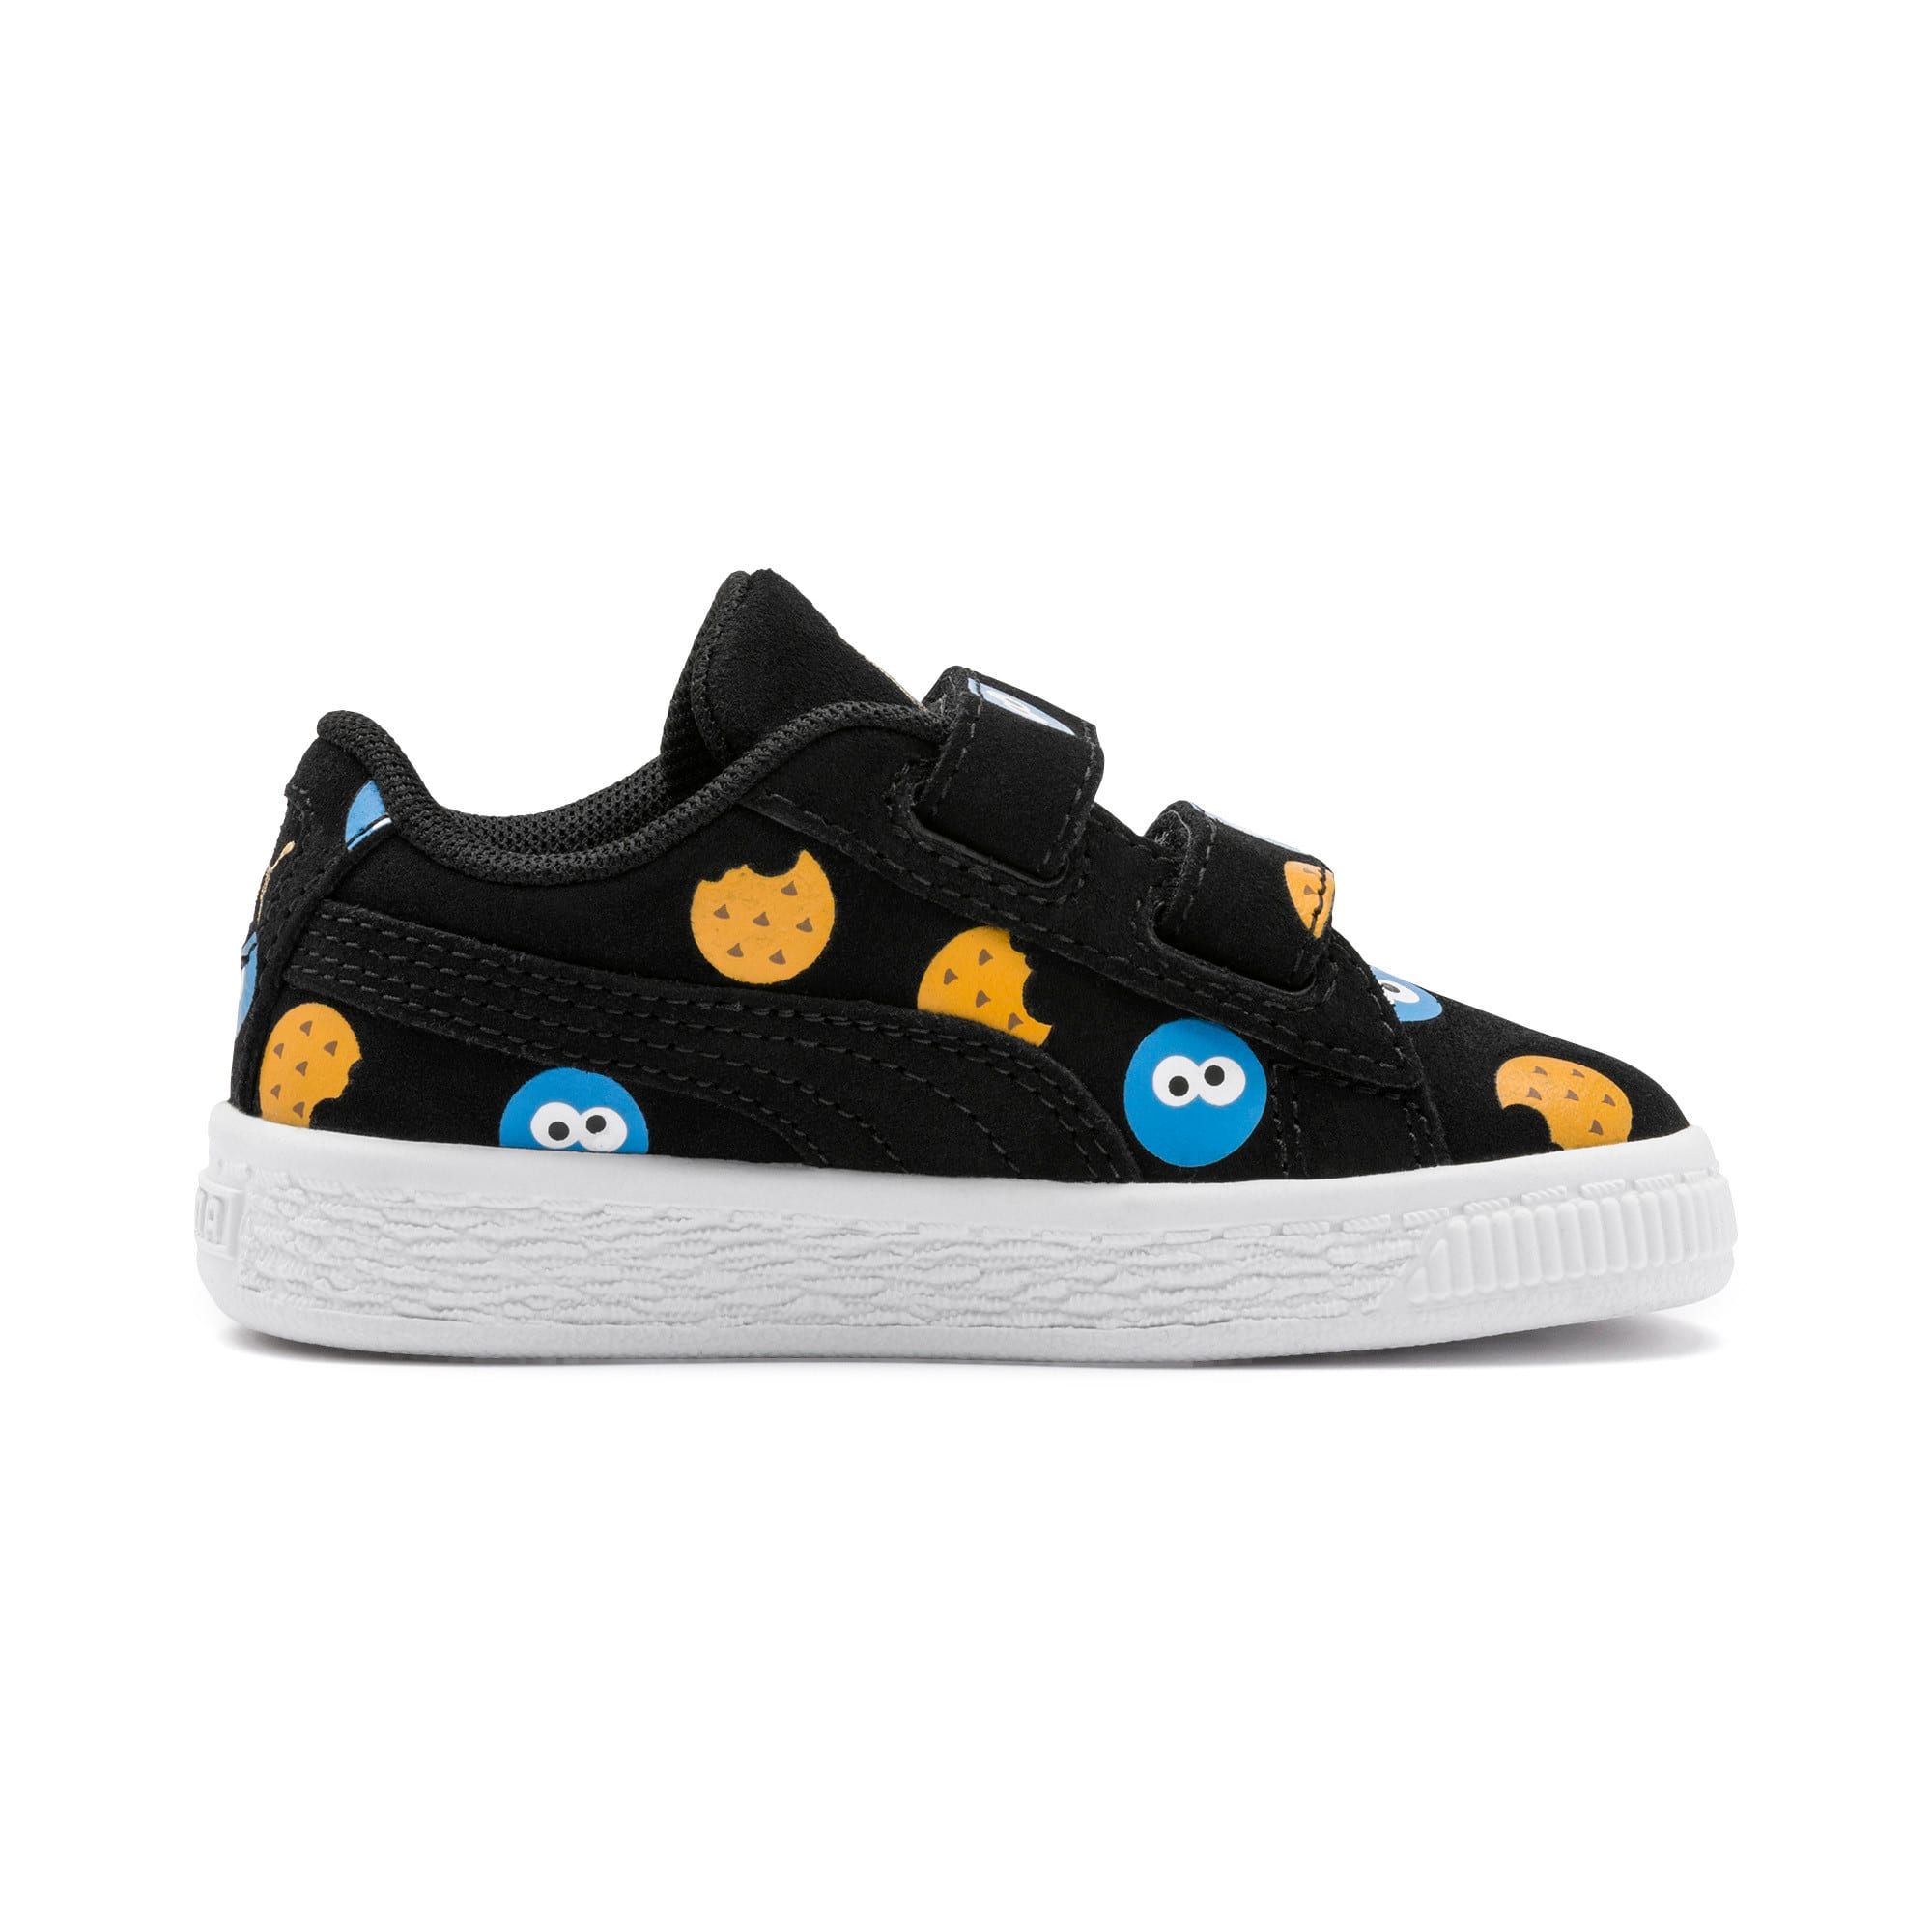 Thumbnail 6 of PUMA x SESAME STREET 50 Suede Badge Toddler Shoes, Puma Black-Bleu Azur, medium